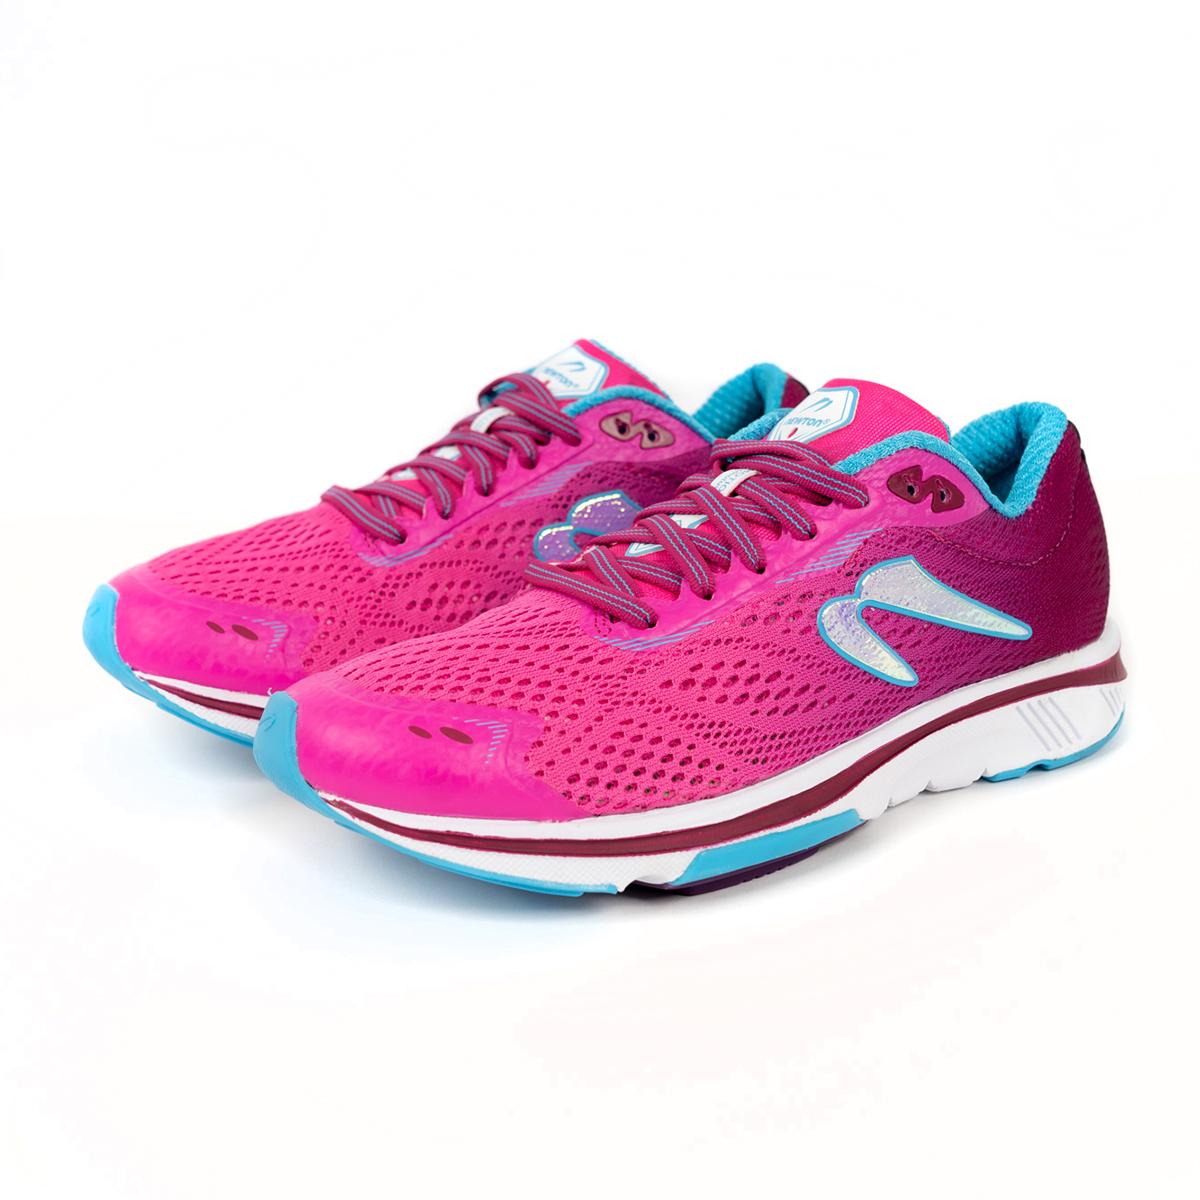 Women's Newton Motion 9 Running Shoe - Color: Pink/Aqua (Regular Width) - Size: 5, Pink/Aqua, large, image 3